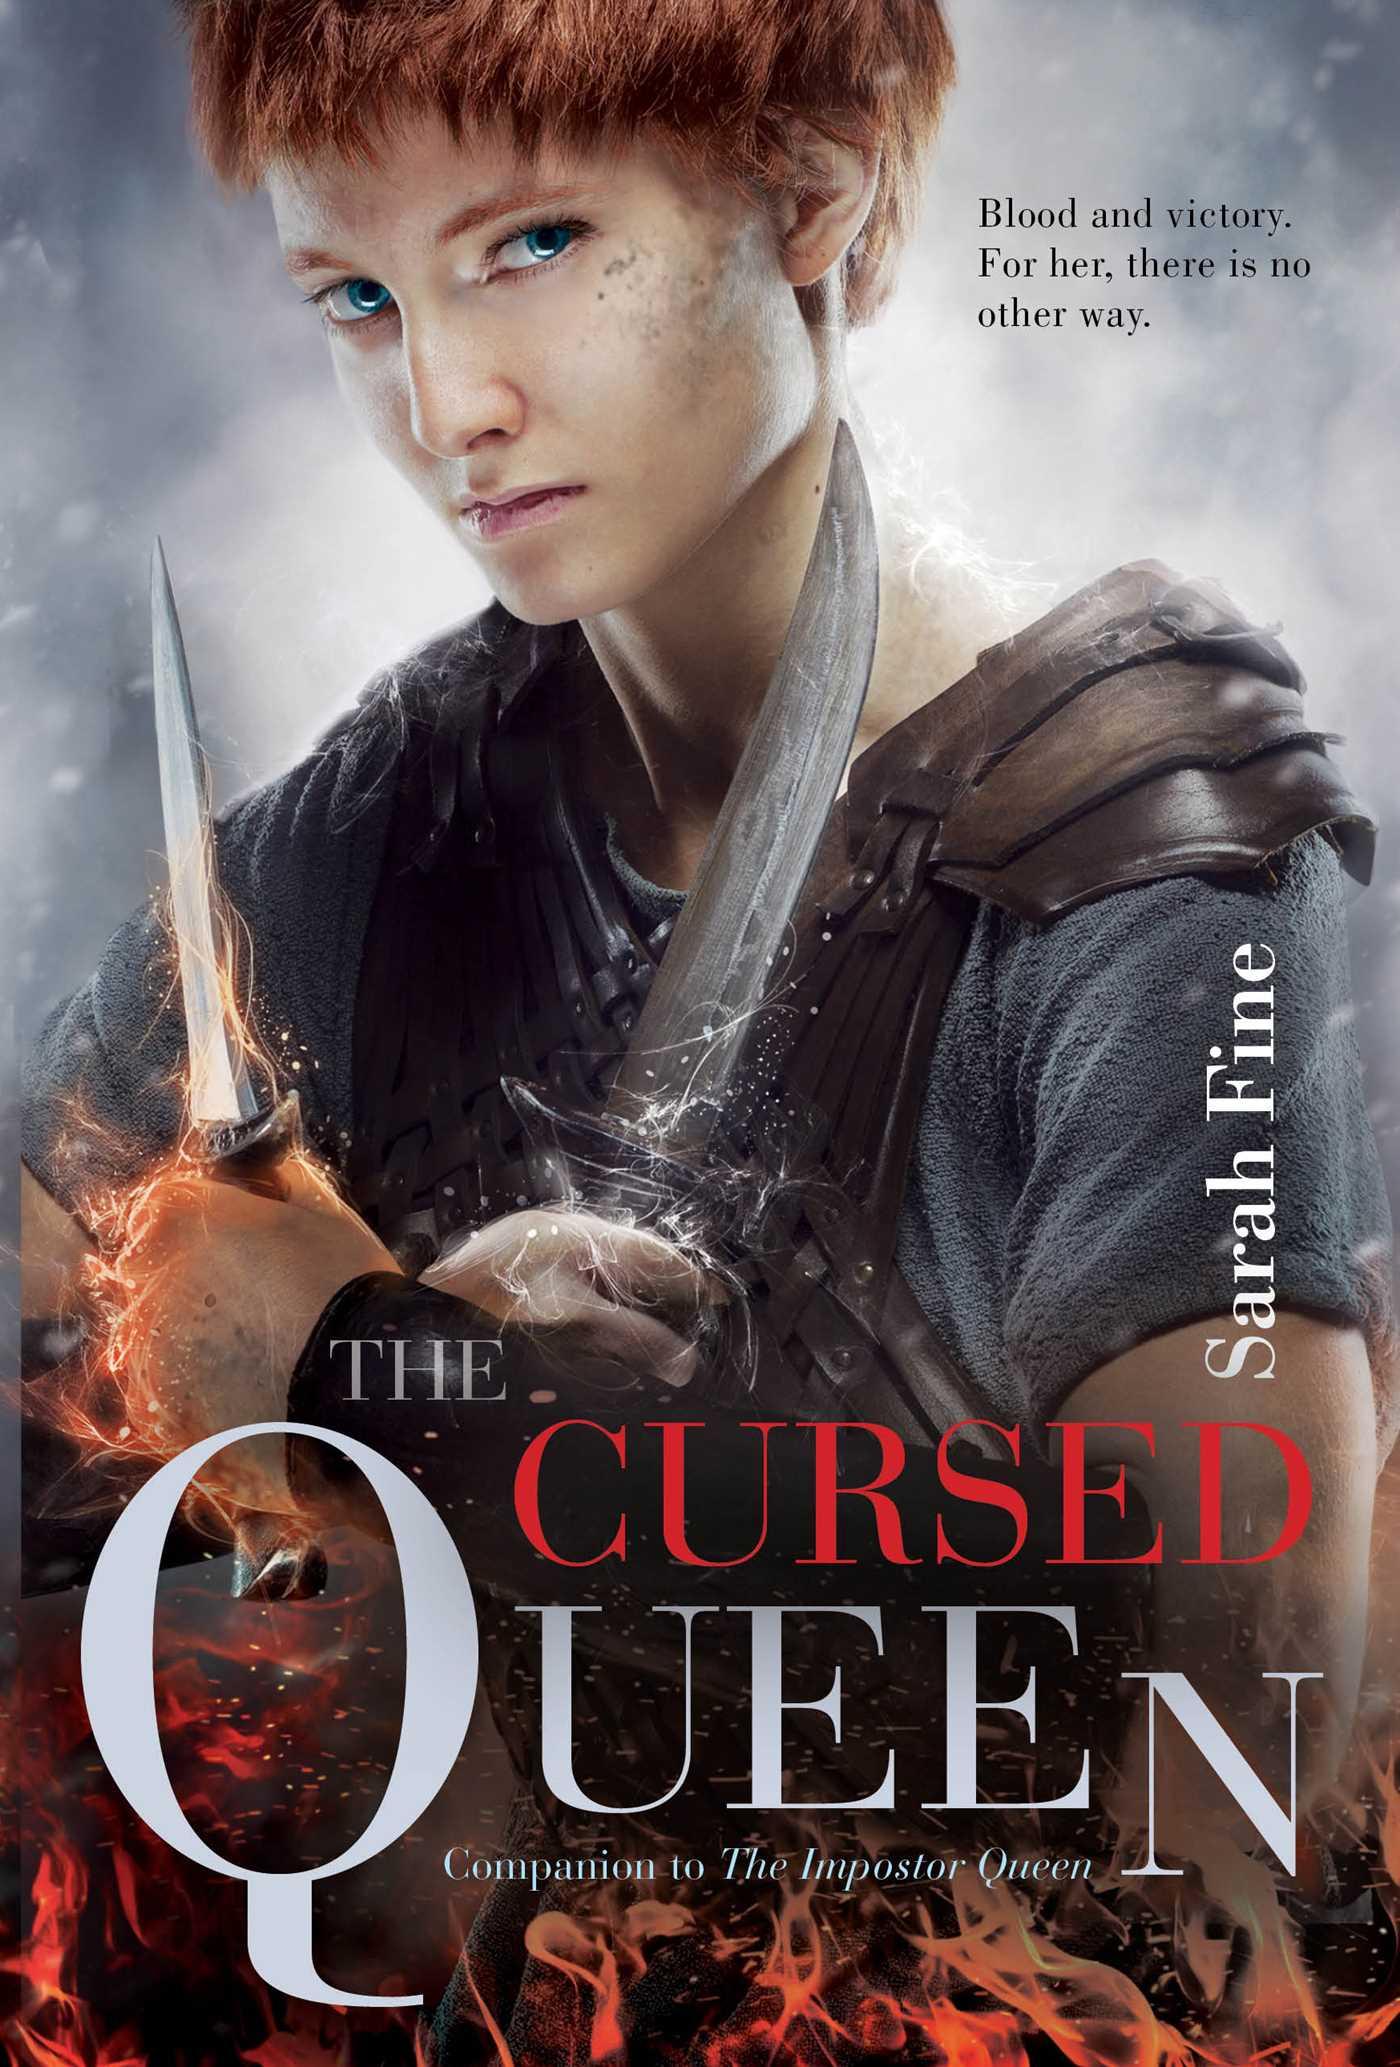 The cursed queen 9781481441933 hr